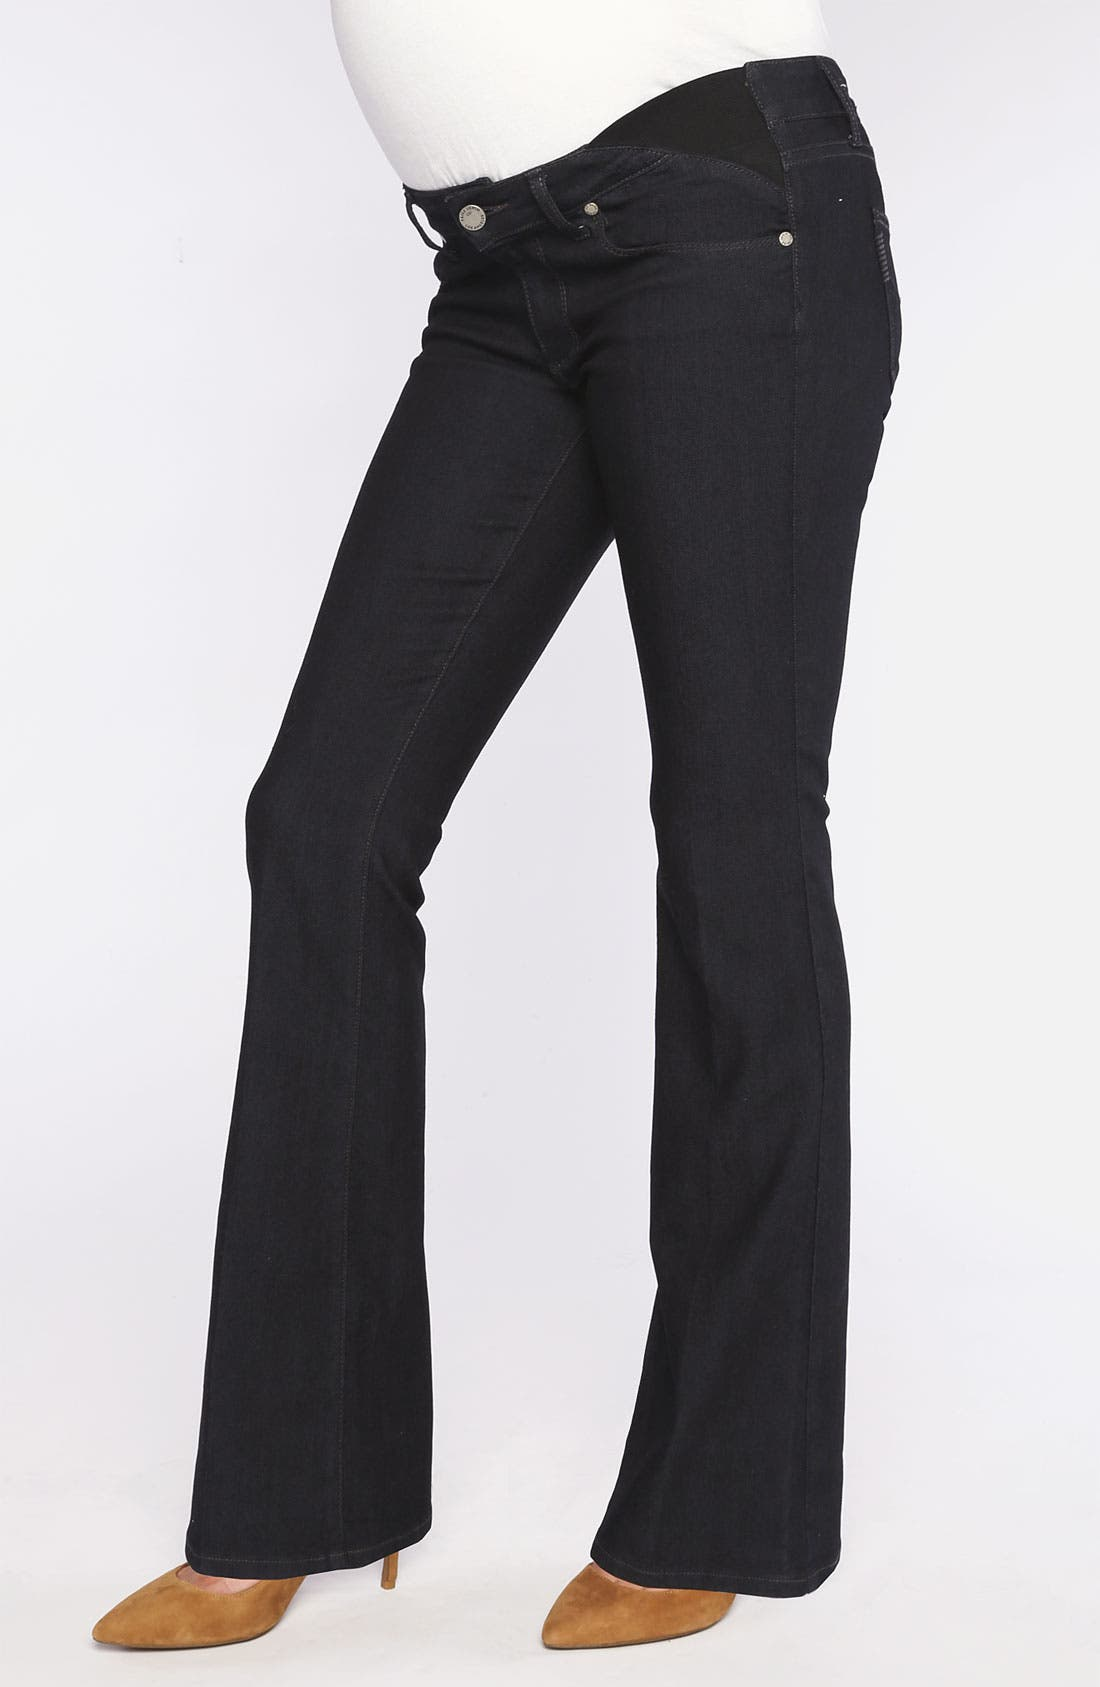 Alternate Image 1 Selected - Paige Denim 'Skyline' Maternity Bootcut Jeans (Petite) (Twilight)